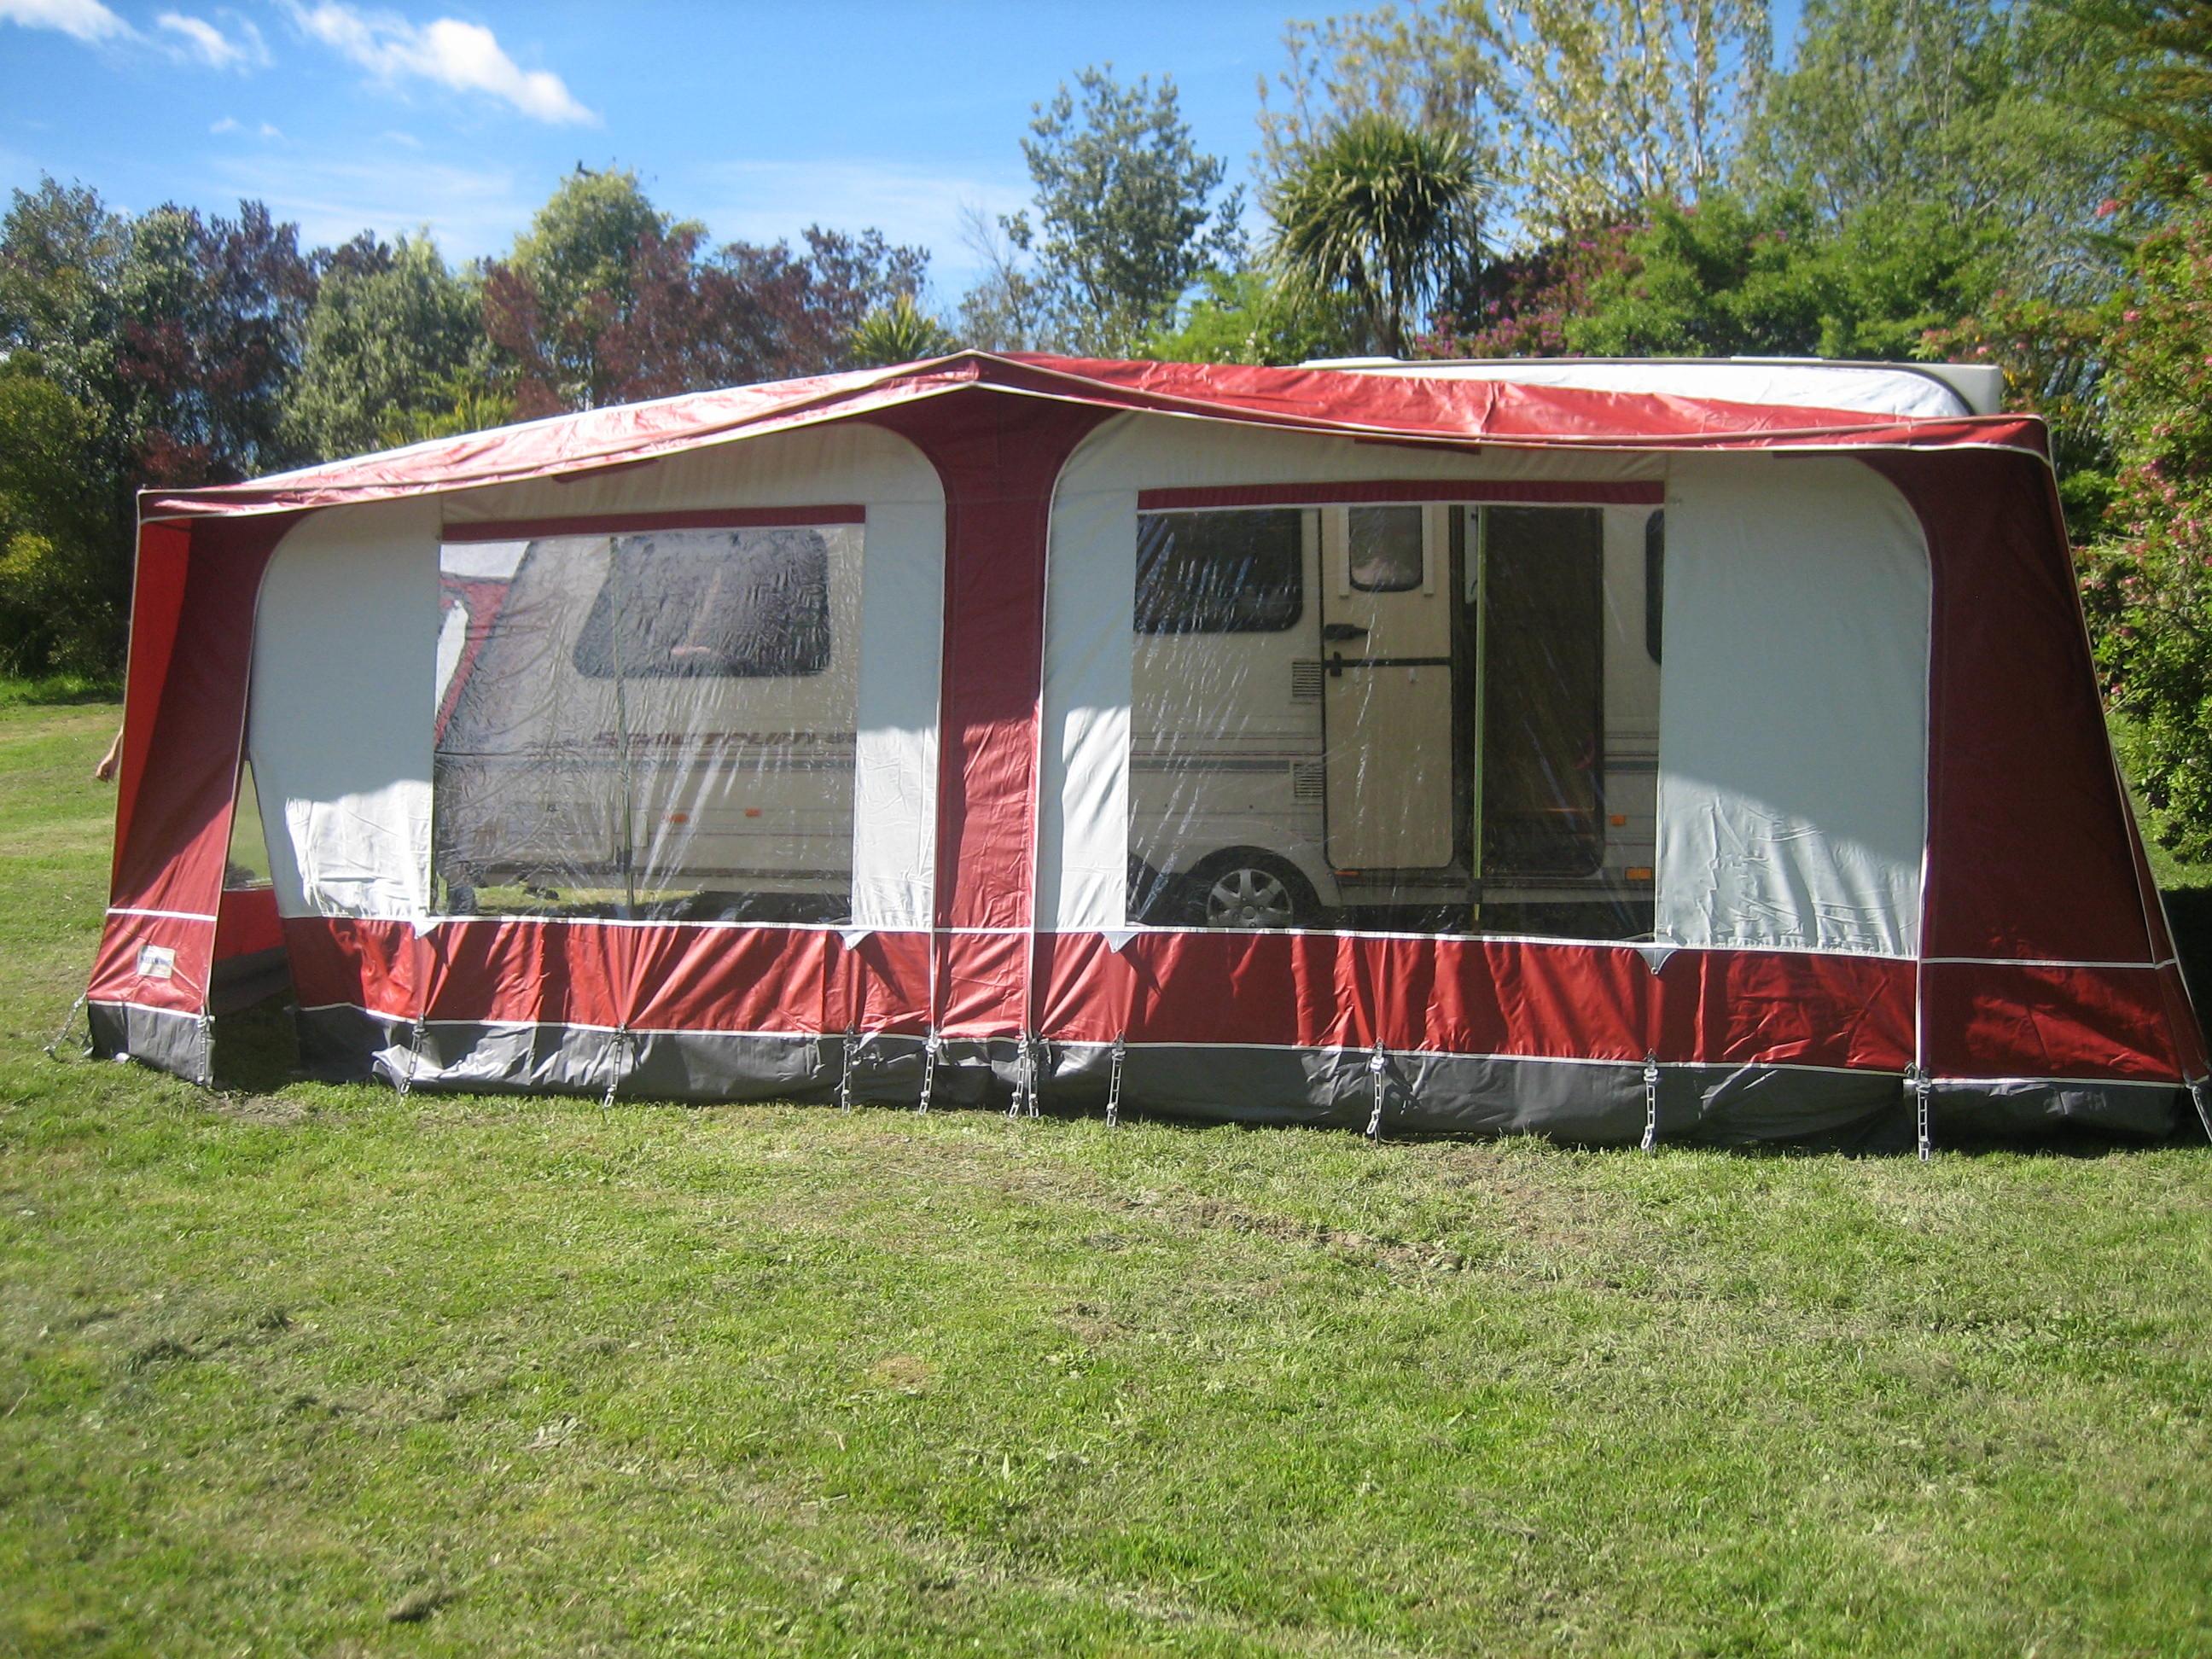 Kina Campers img 0862 Caravan 4/5 berth large 26 Abbey Spectrum 520